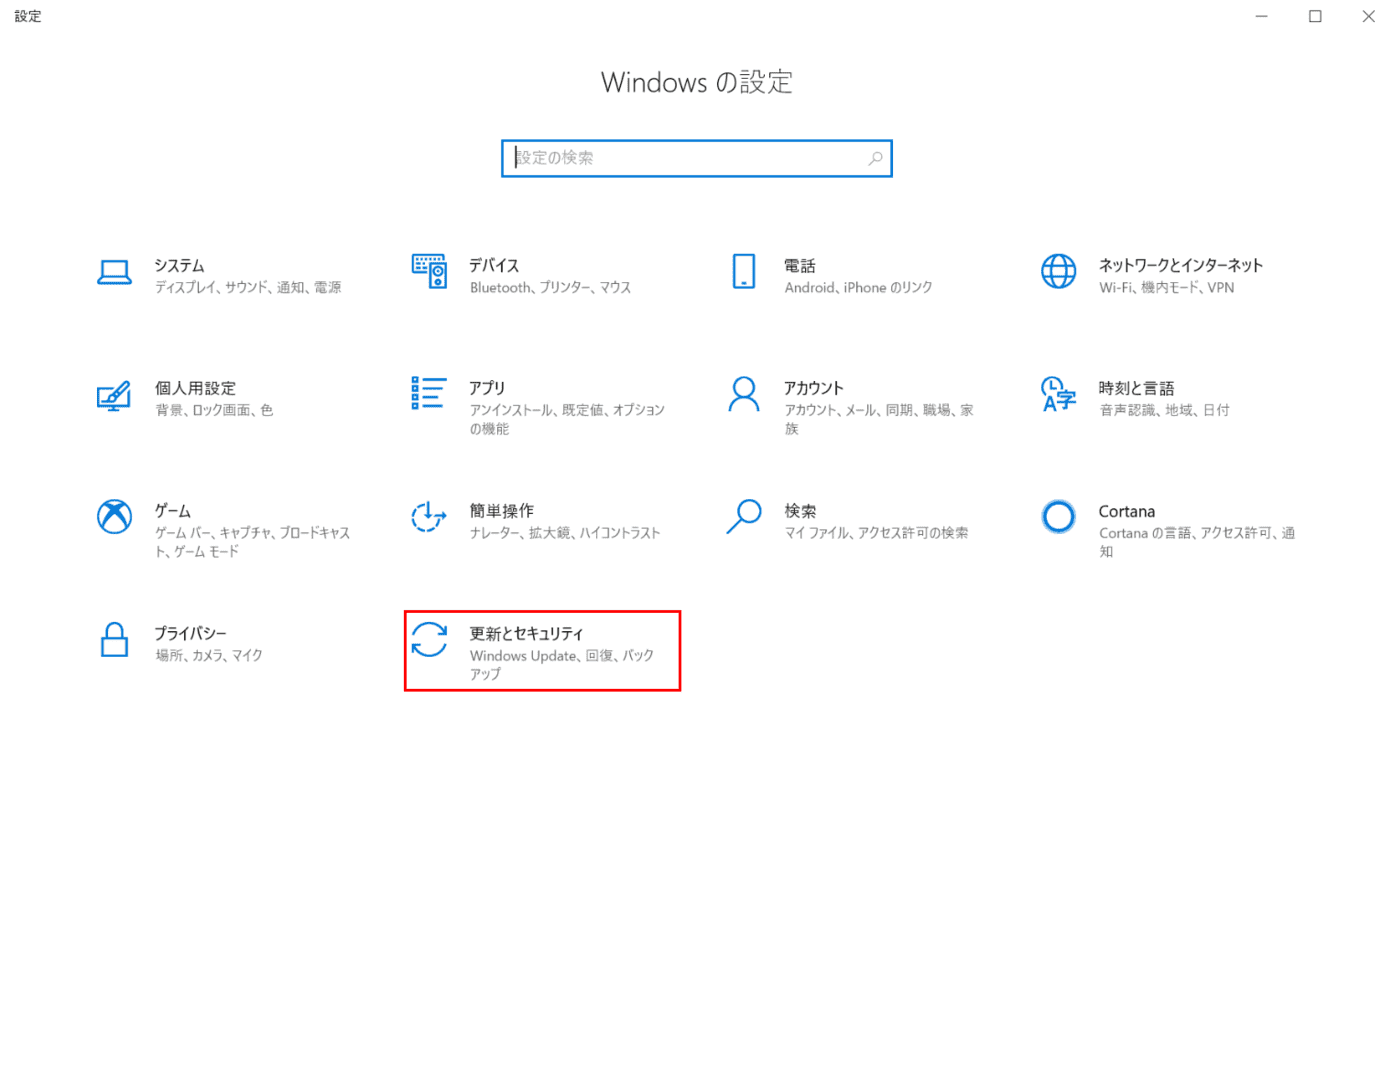 Windowsの設定、更新とセキュリティ